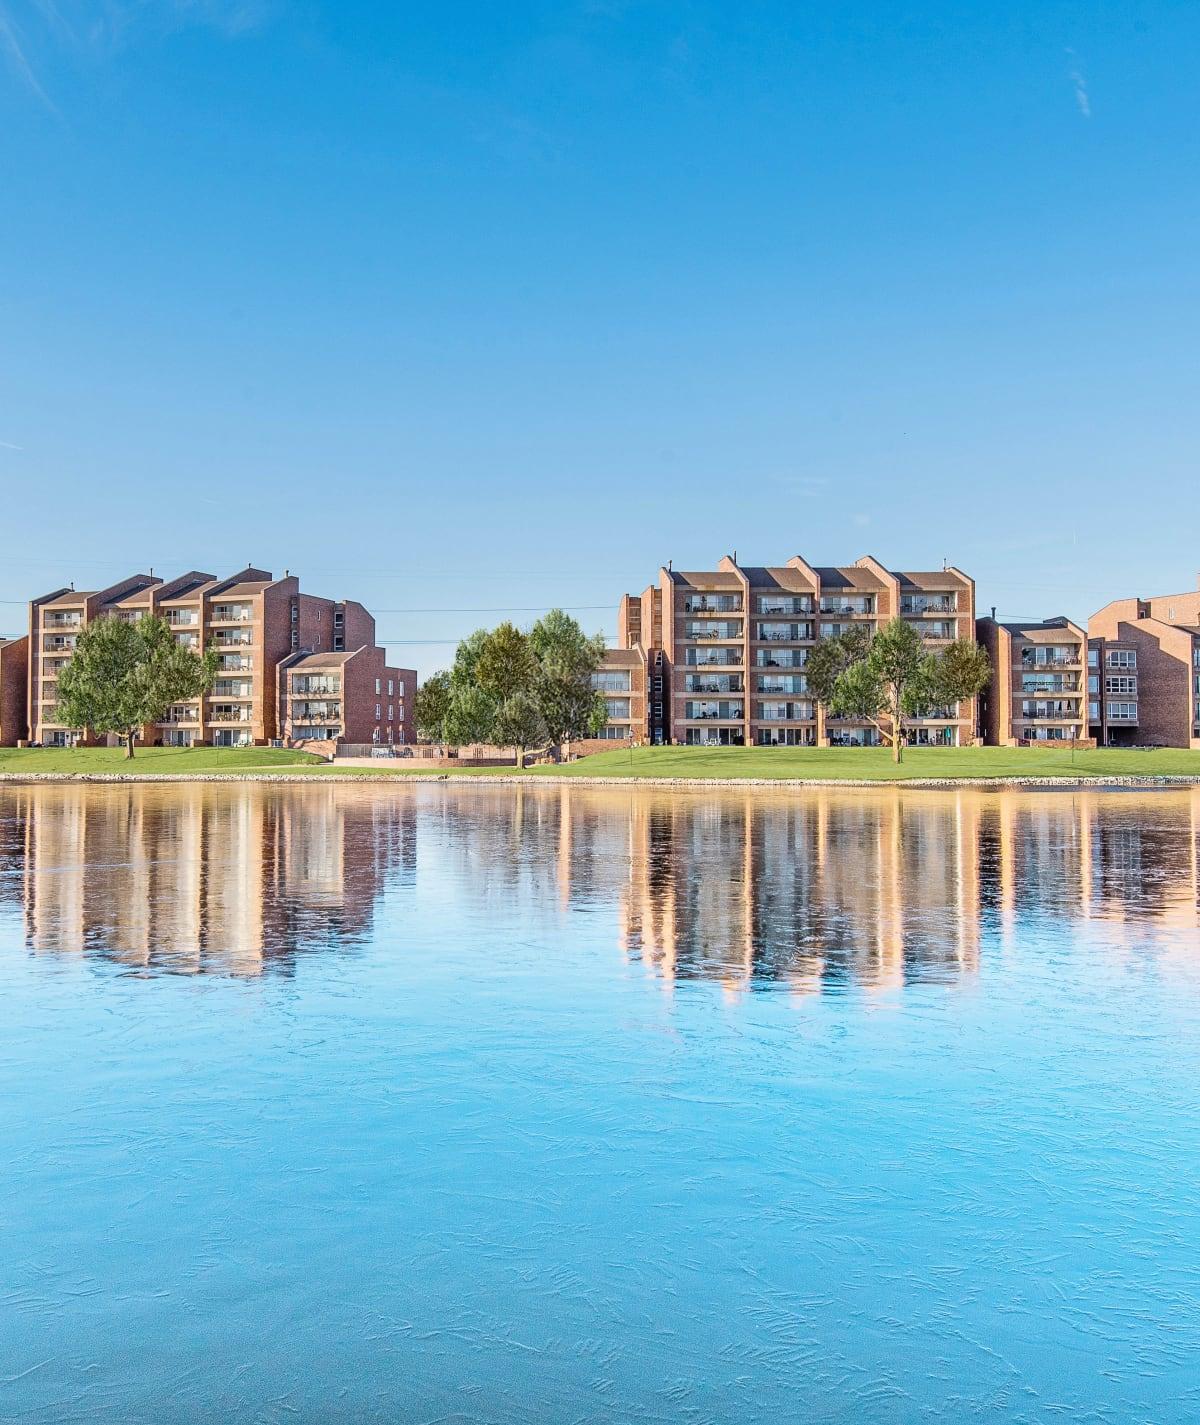 Regency Lakeside Apartment Homes sits on the shore of Lake Regency in Omaha, NE